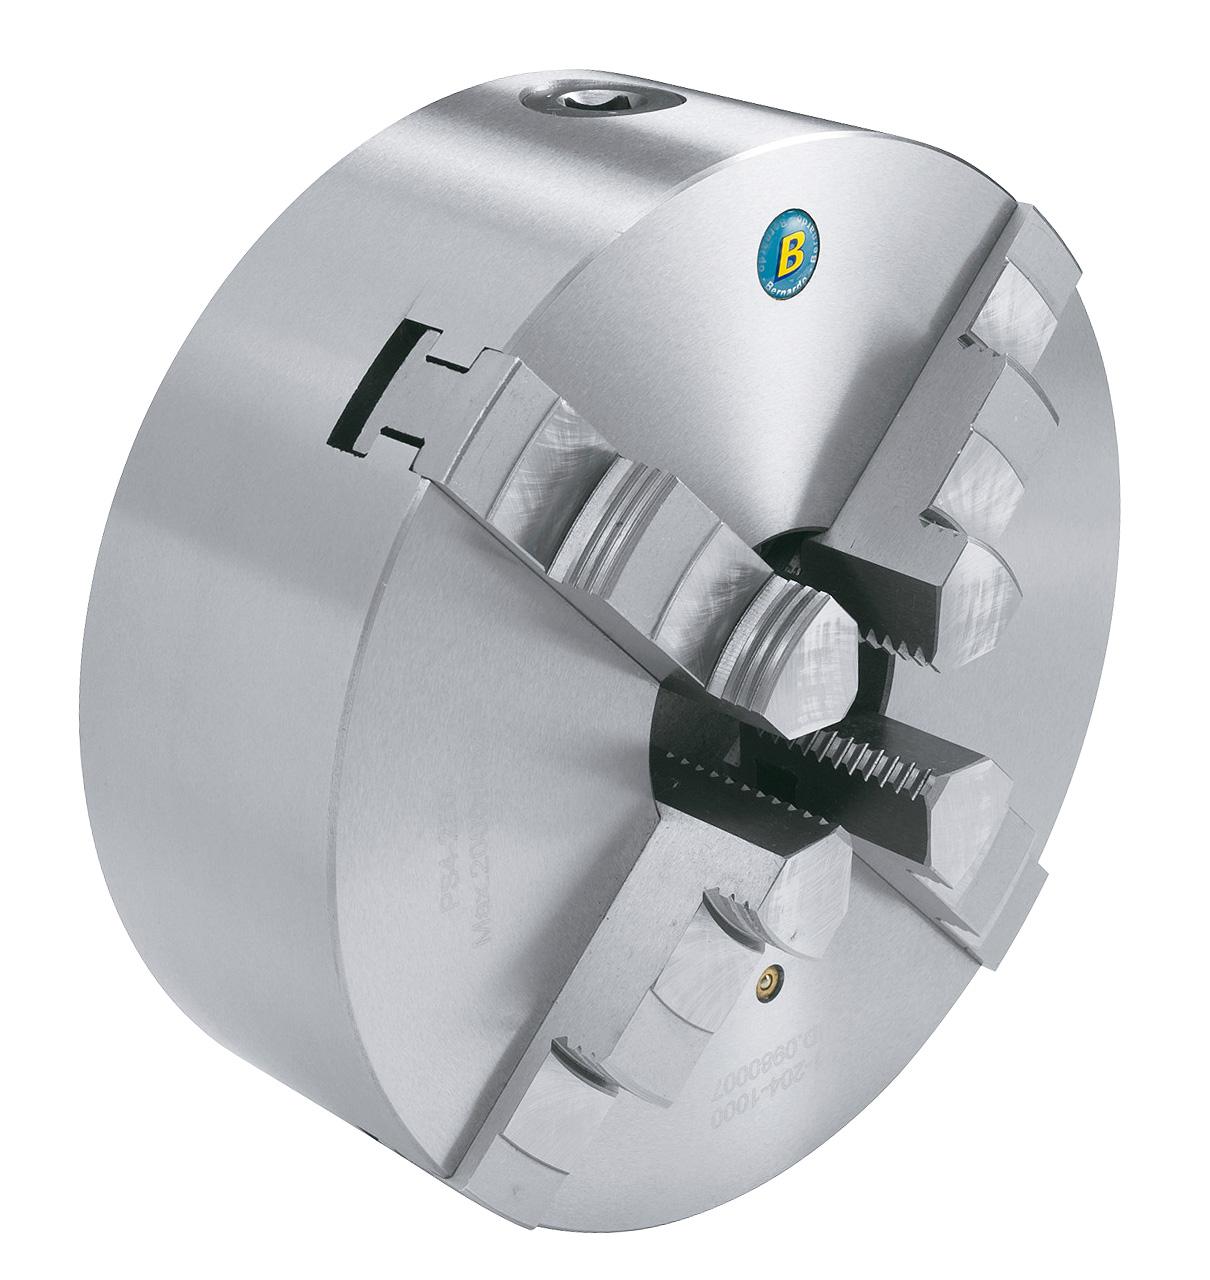 4 bakket centrerpatron standard DK12-160